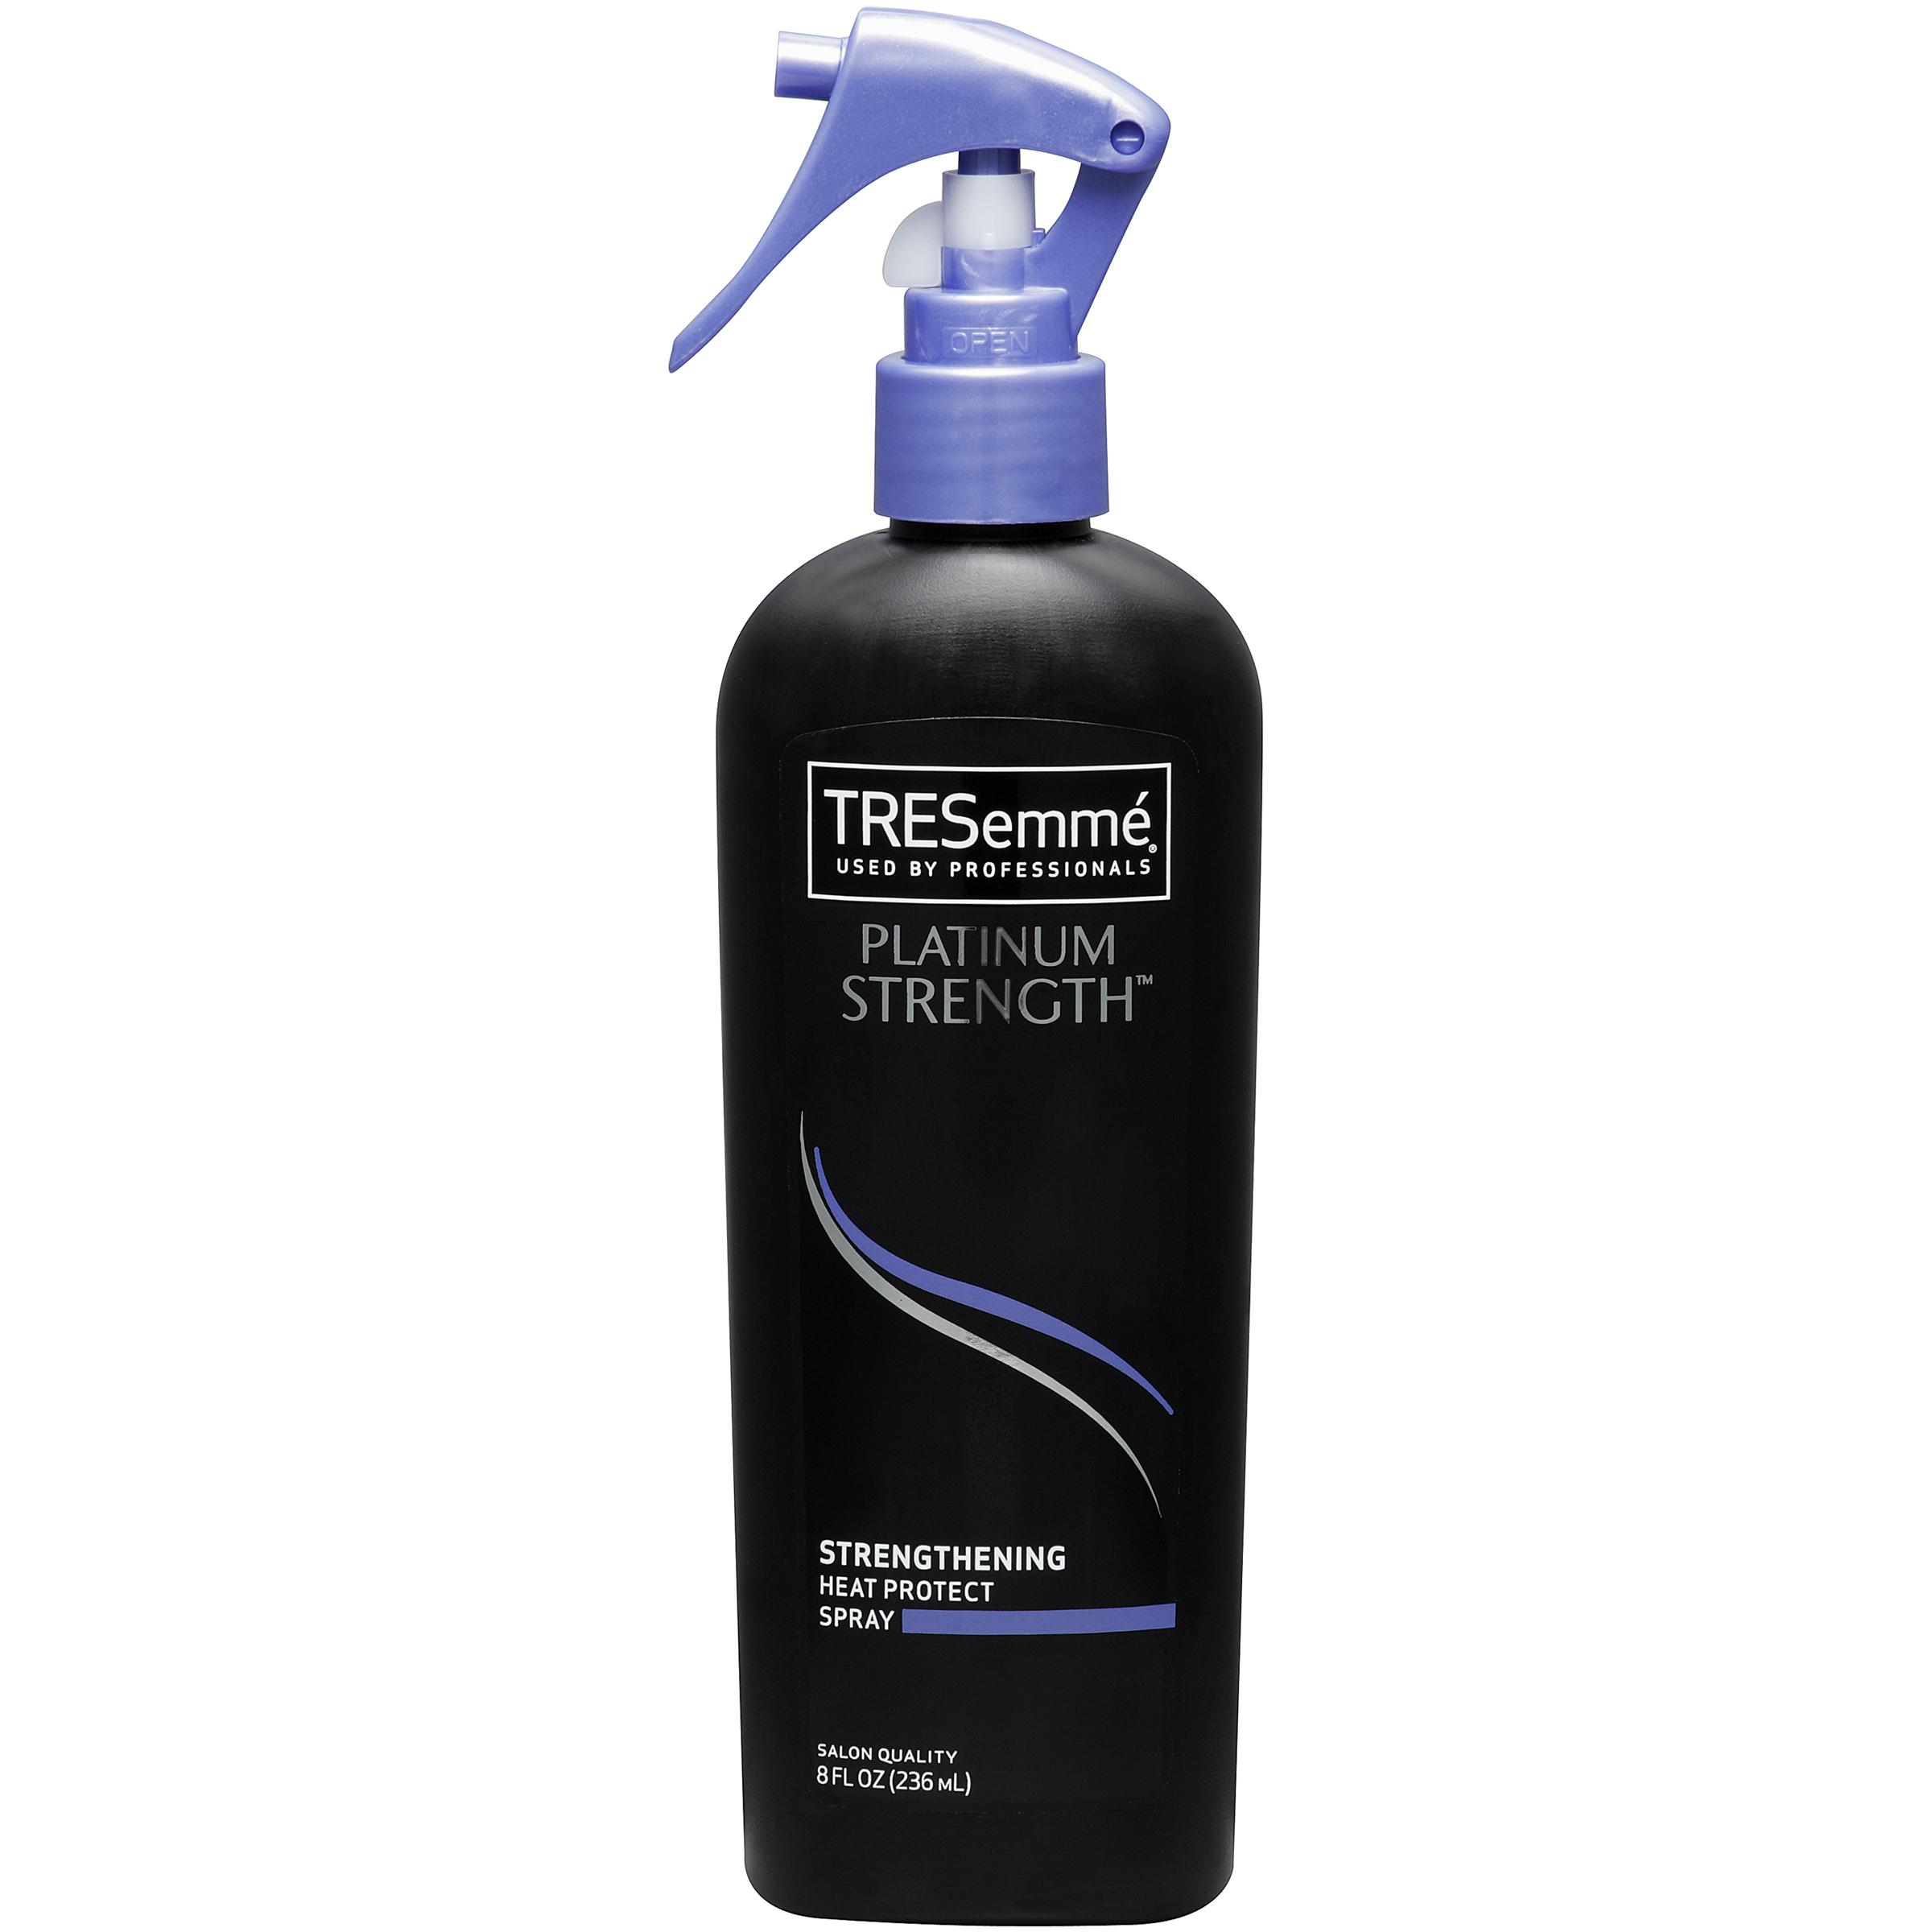 Platinum Strength Strengthening Heat Protect Spray 8 FL OZ TRIGGER SPRAY